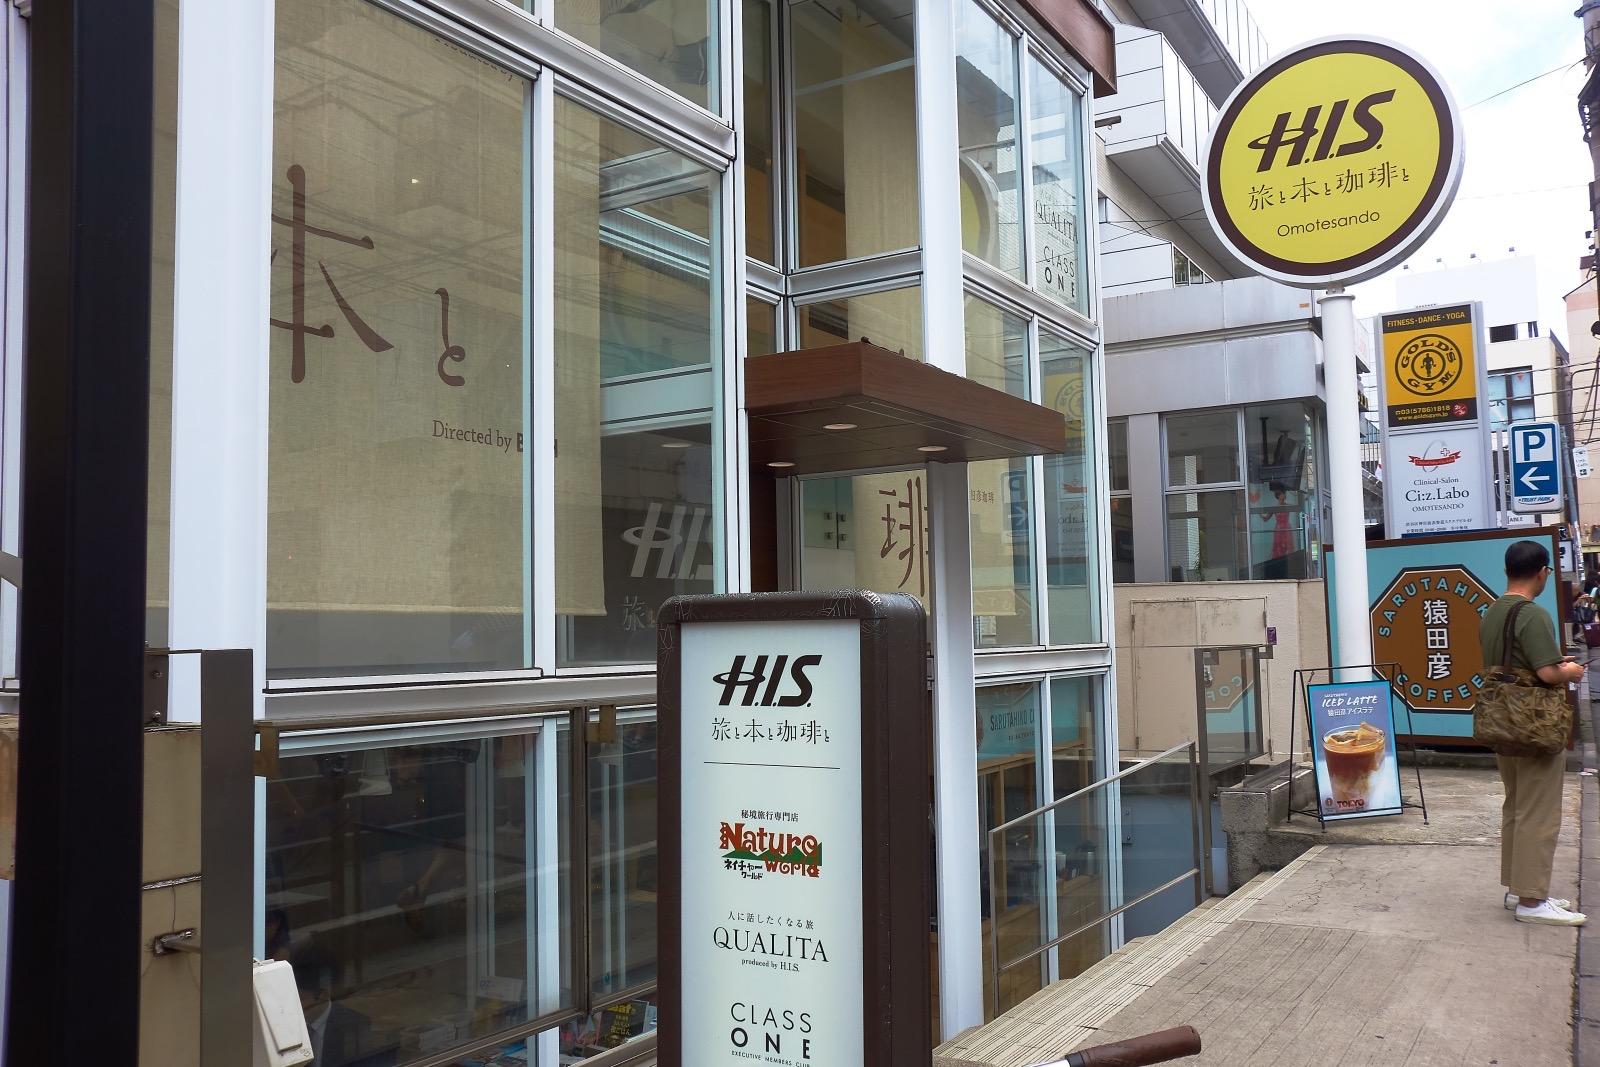 H.I.S.旅と本と珈琲とOmotesando